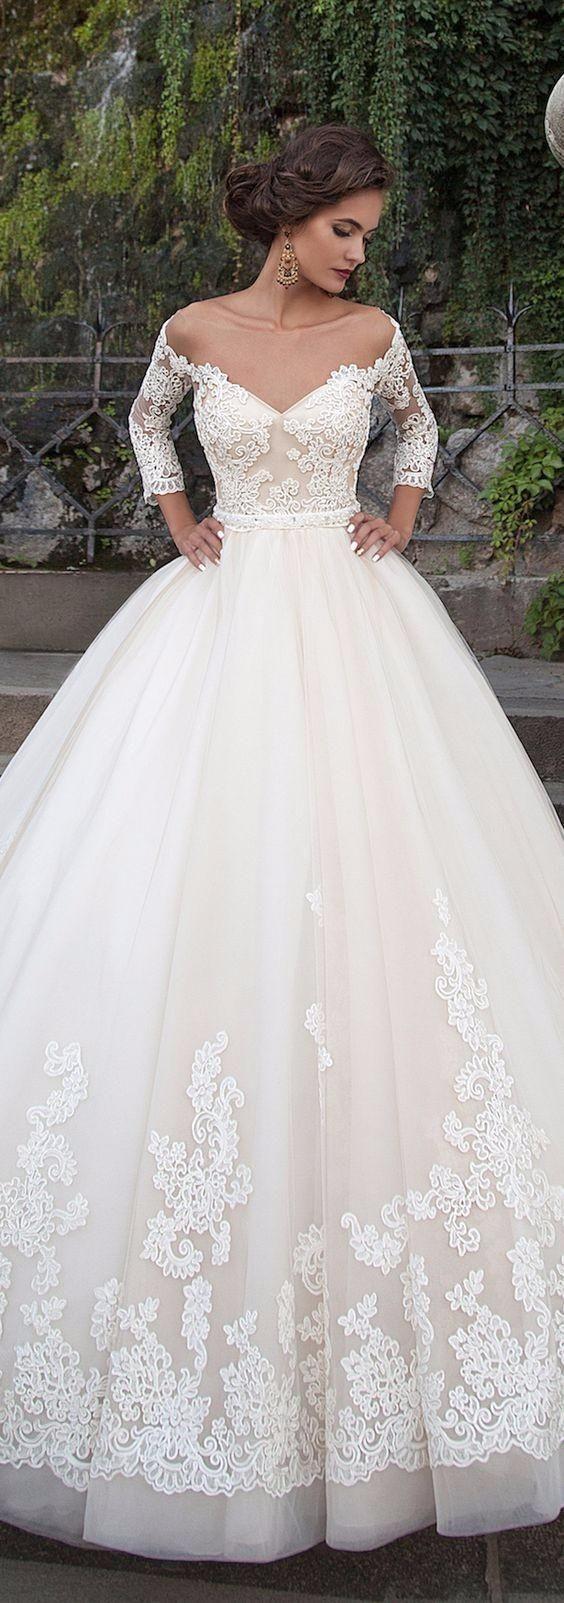 3 4 sleeve lace wedding dress  Classy  sleeve lace wedding dress  mode mariée  Pinterest